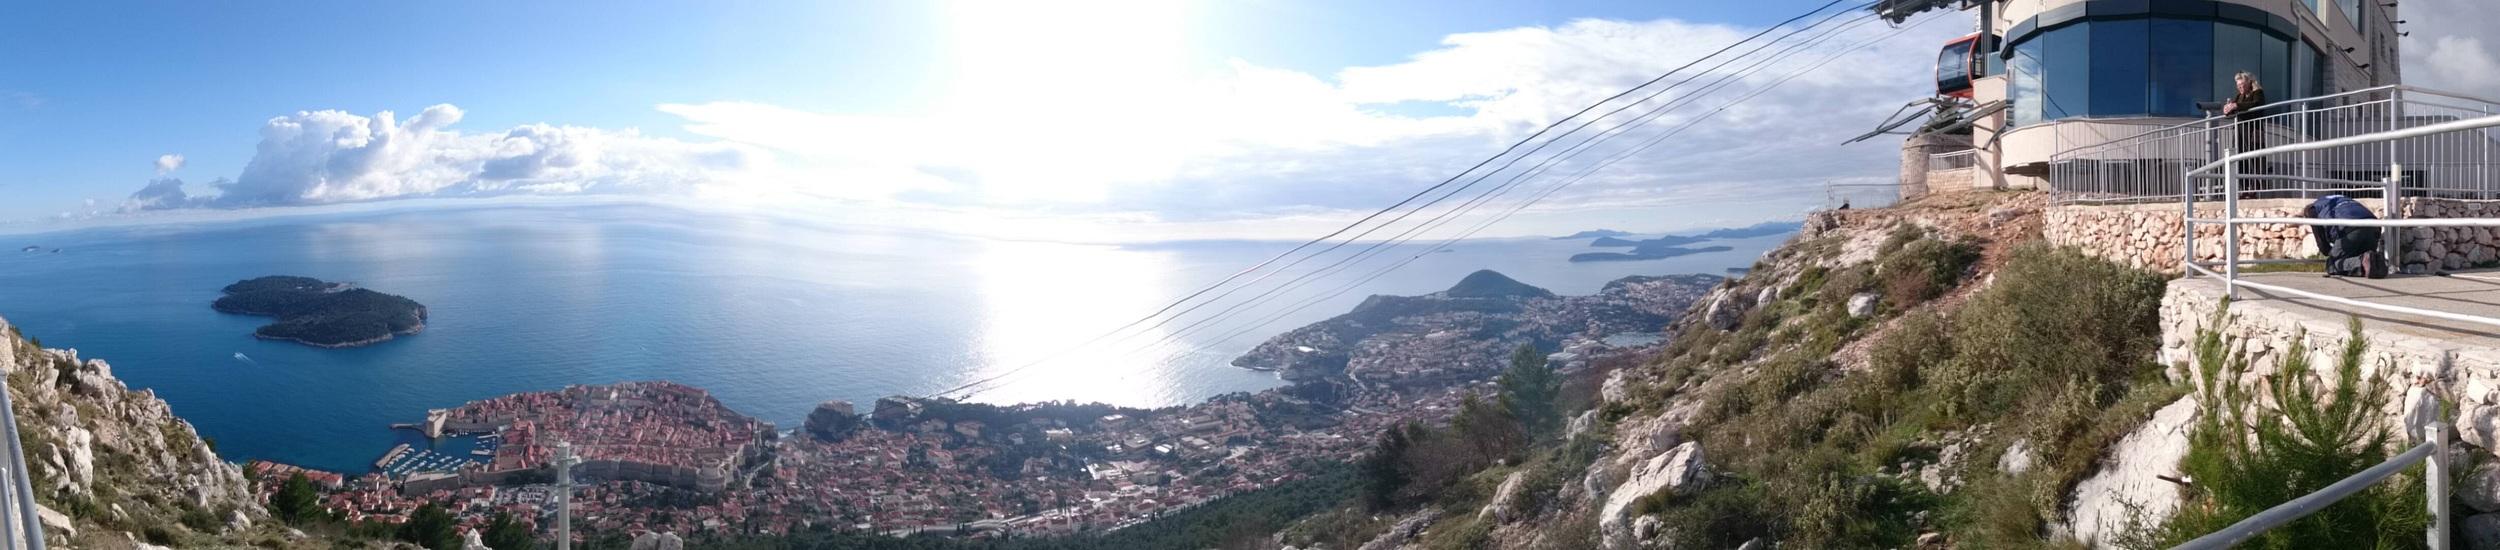 dubrovnik-panorama.jpg